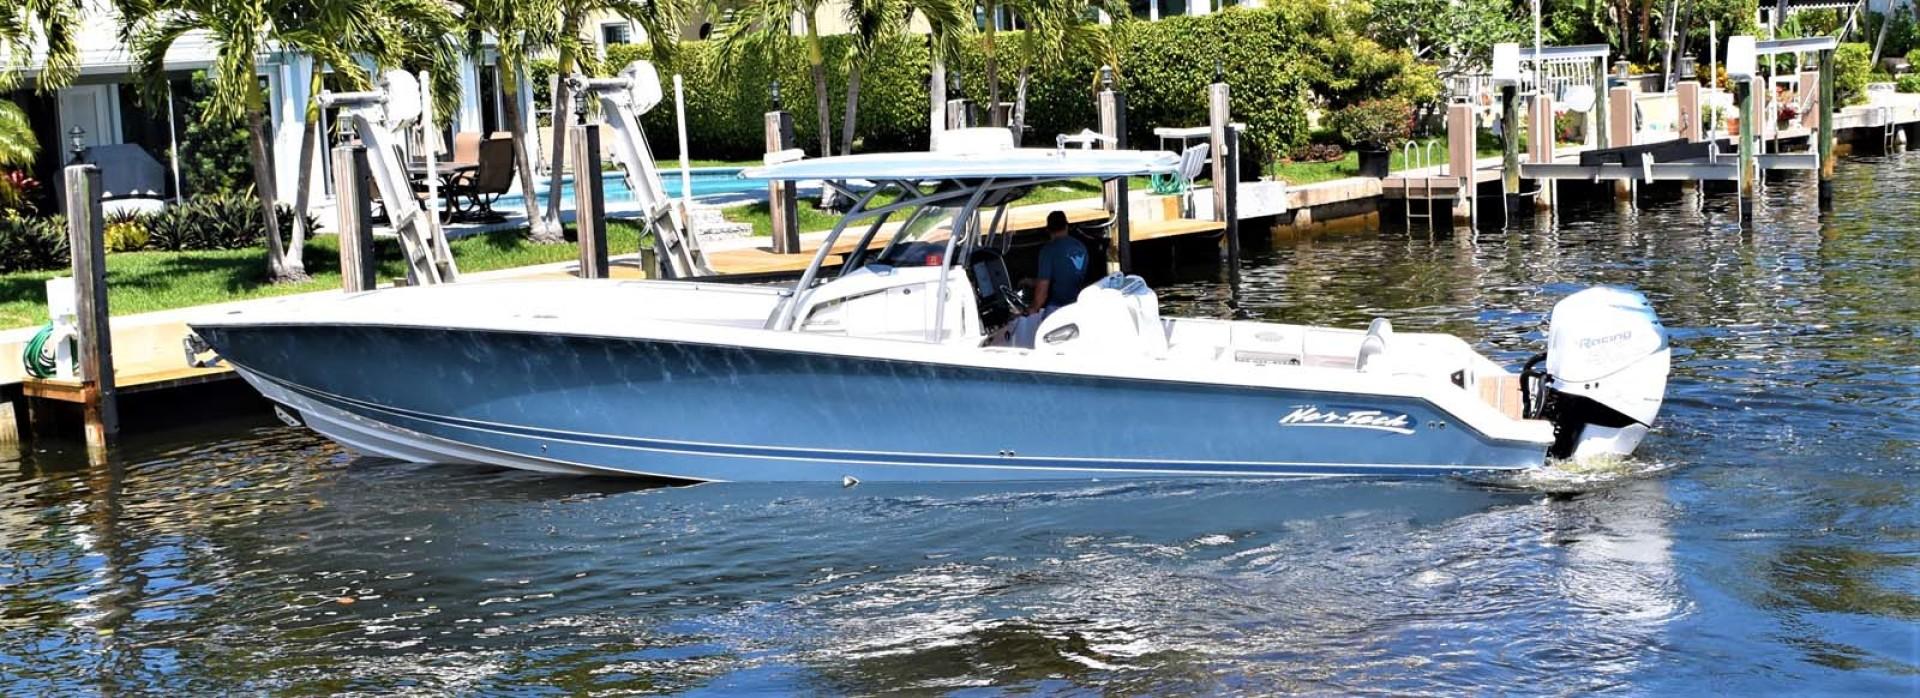 Nor-Tech-390 Sport 2018 -Boca Raton-Florida-United States-Port Side-1130600 | Thumbnail